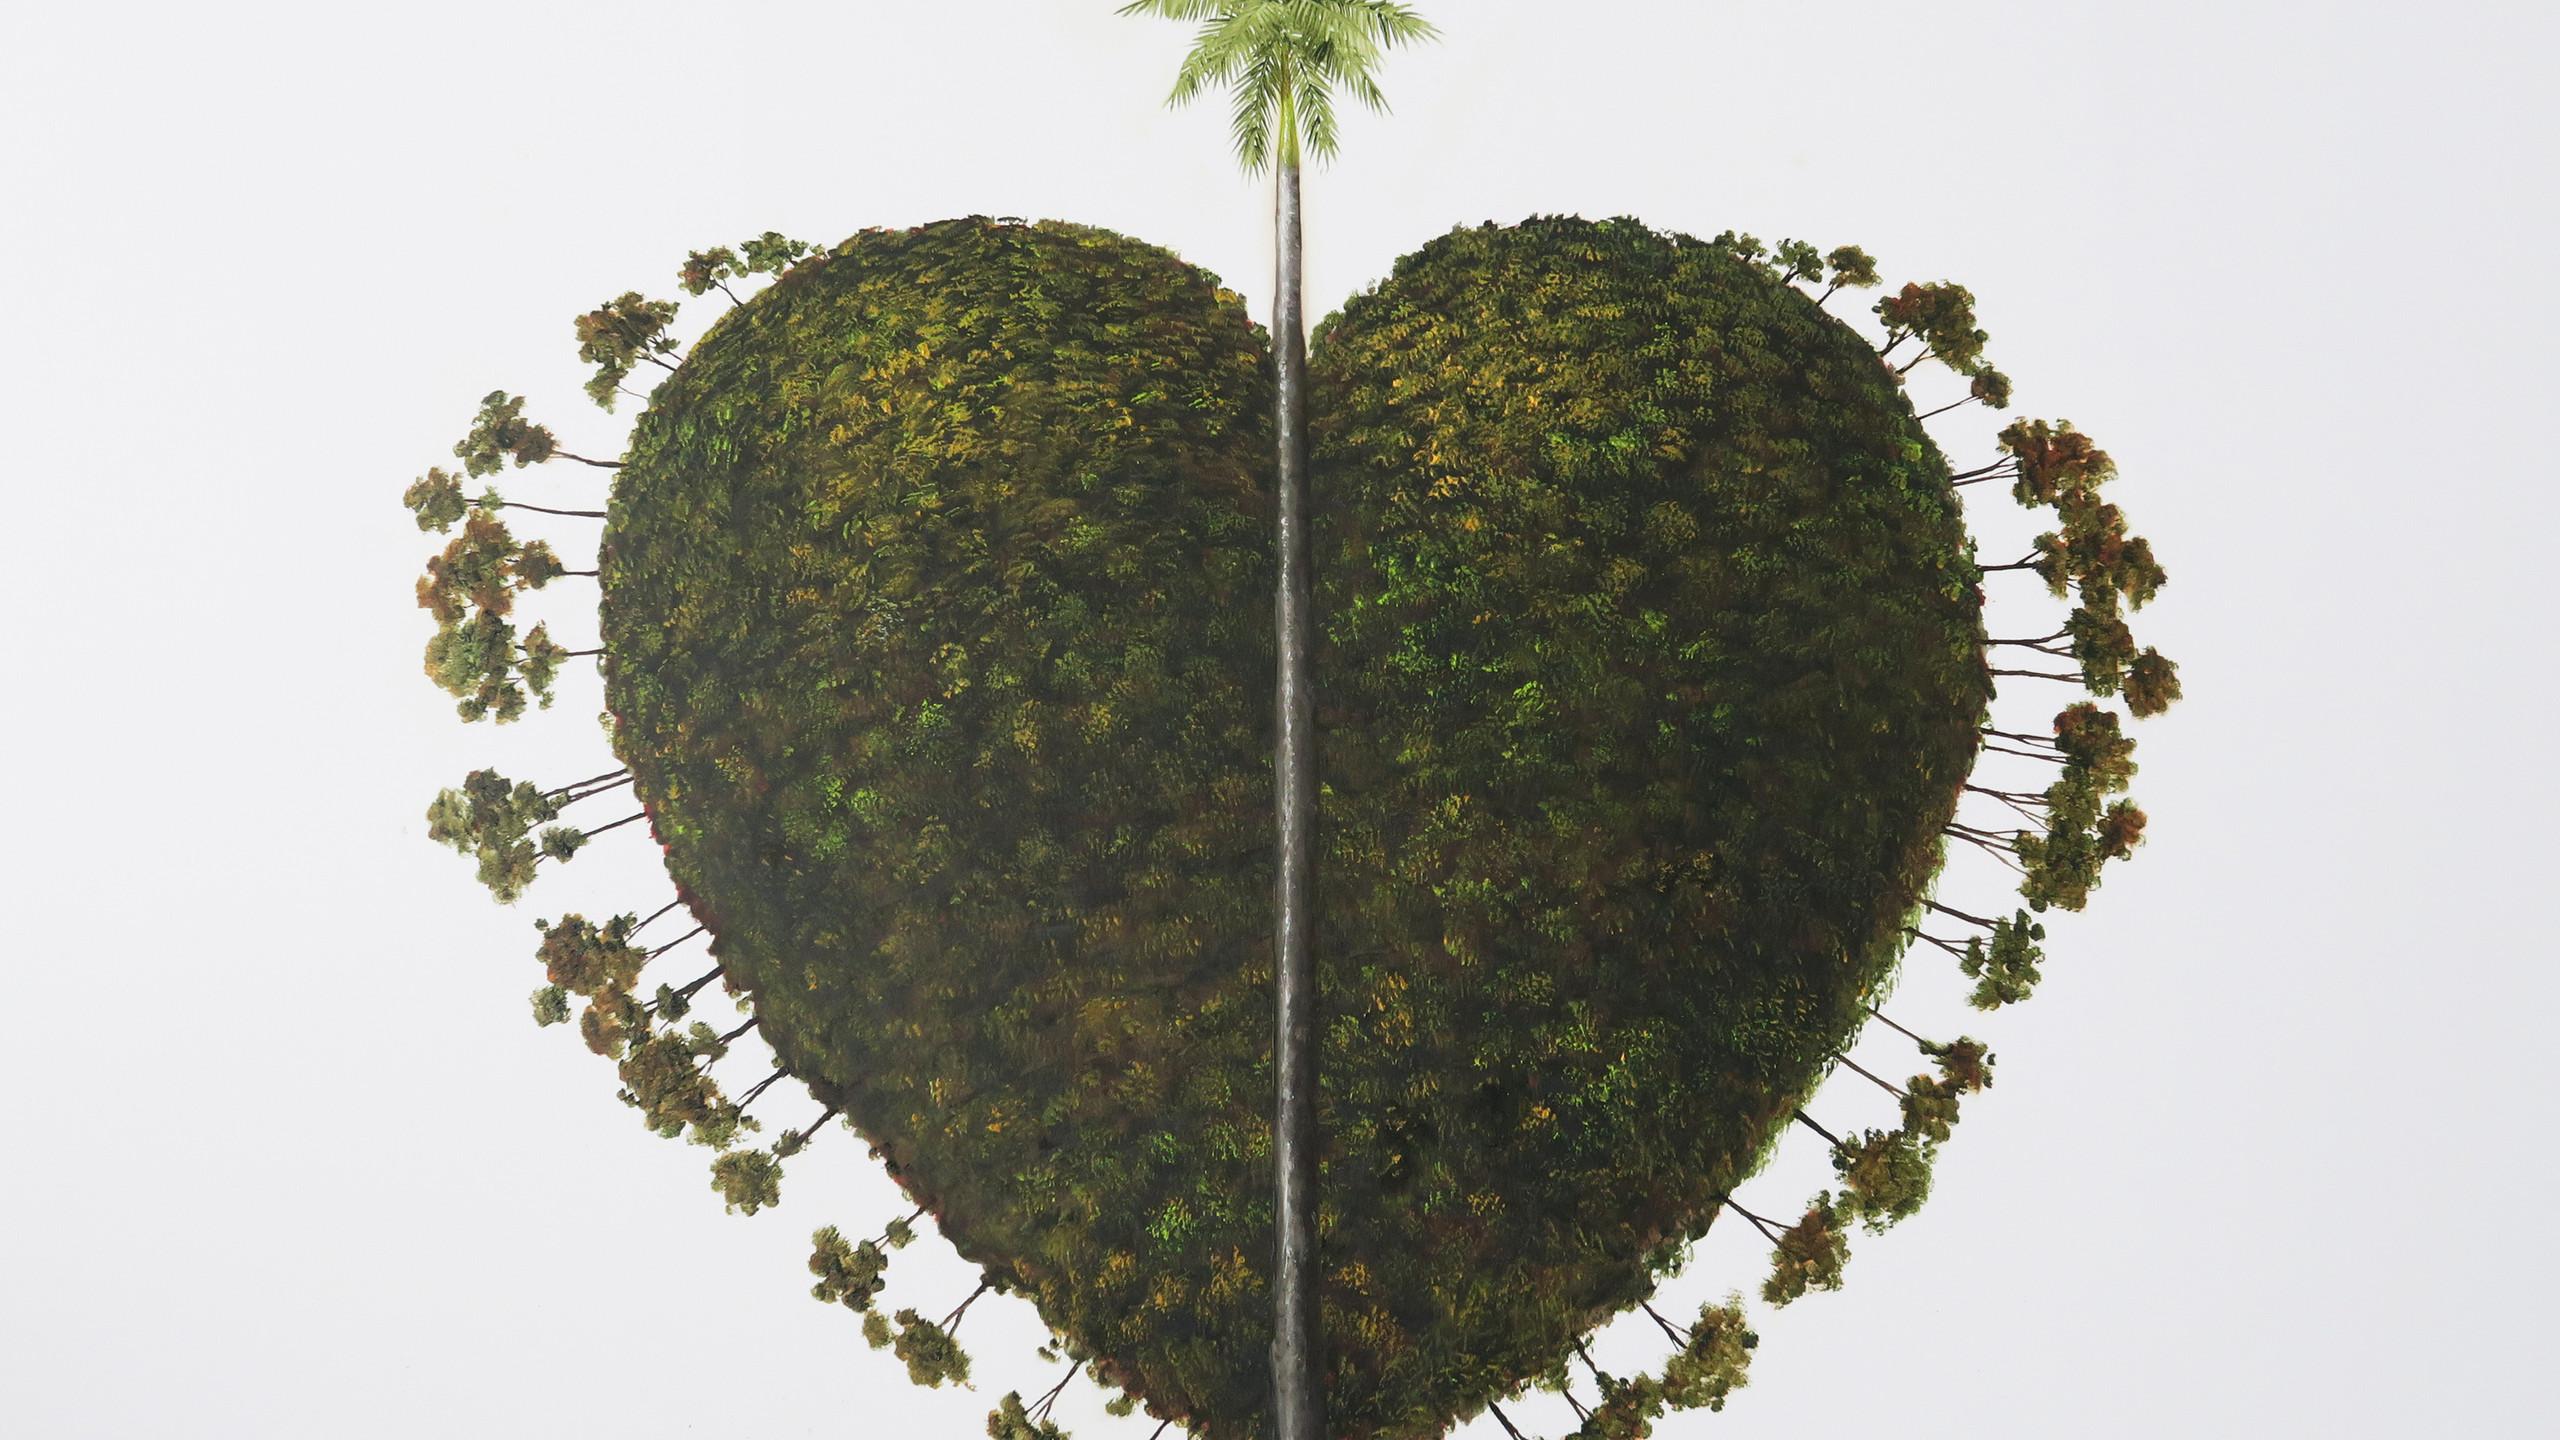 corazon-palma-de-cera-1556639924